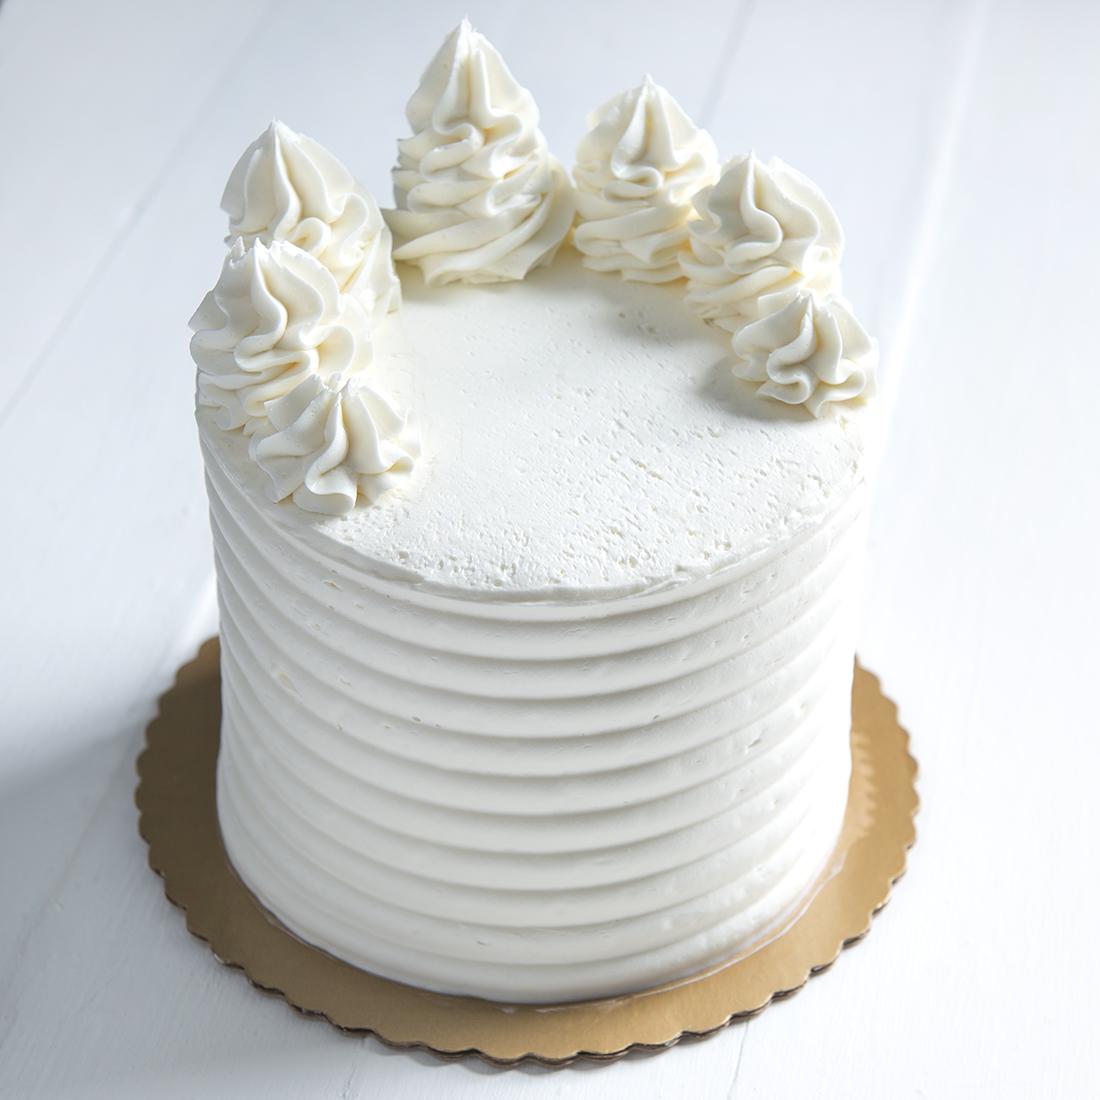 "Vegan Strawberry - Strawberry cake layered with strawberry buttercream, vanilla buttercream frosting6"" $40 9"" 55 10"" 70 12"" 90"